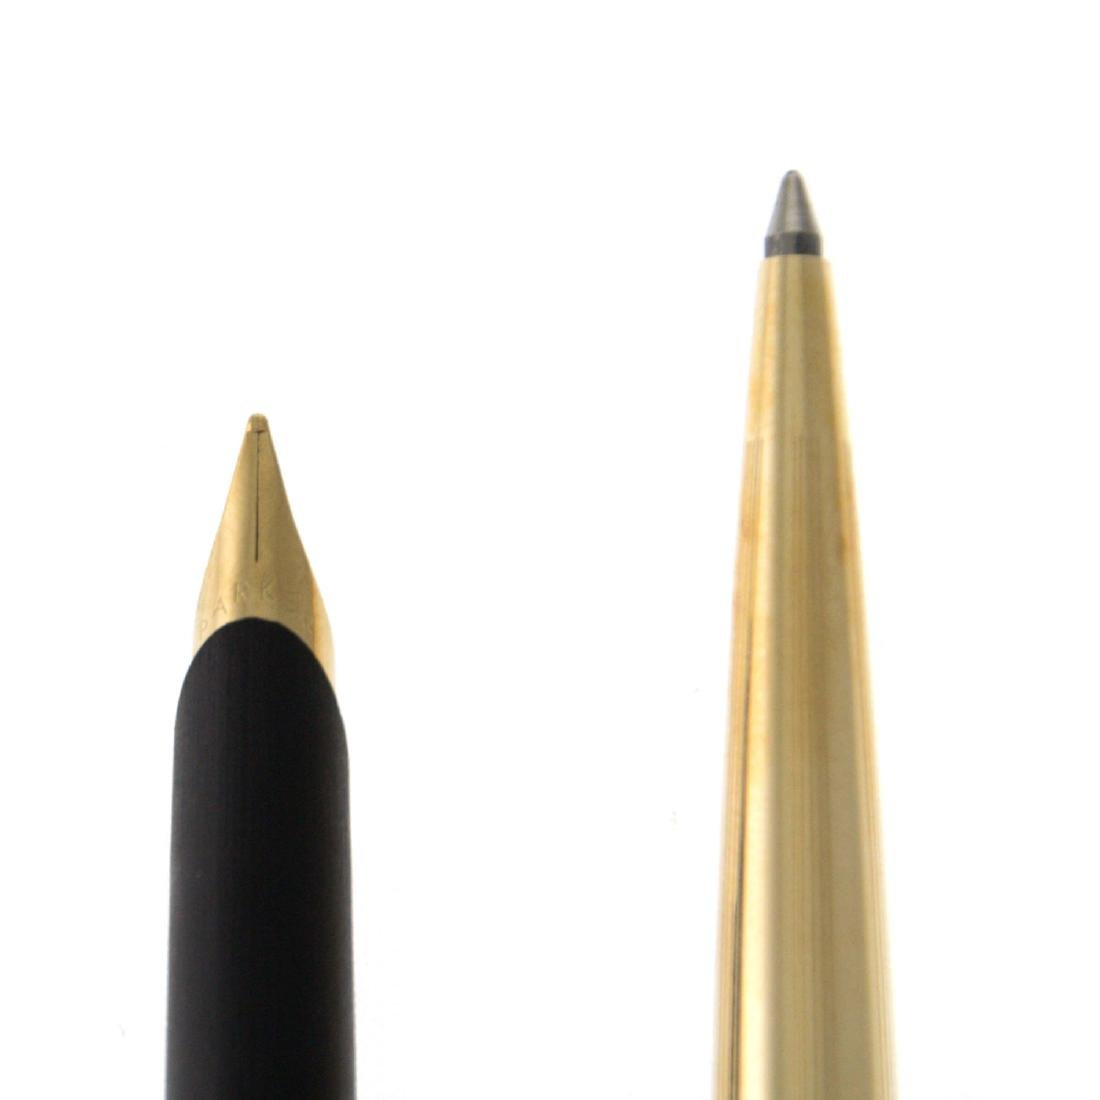 Parker Fountain Pen and Ballpoint Pen. - 3